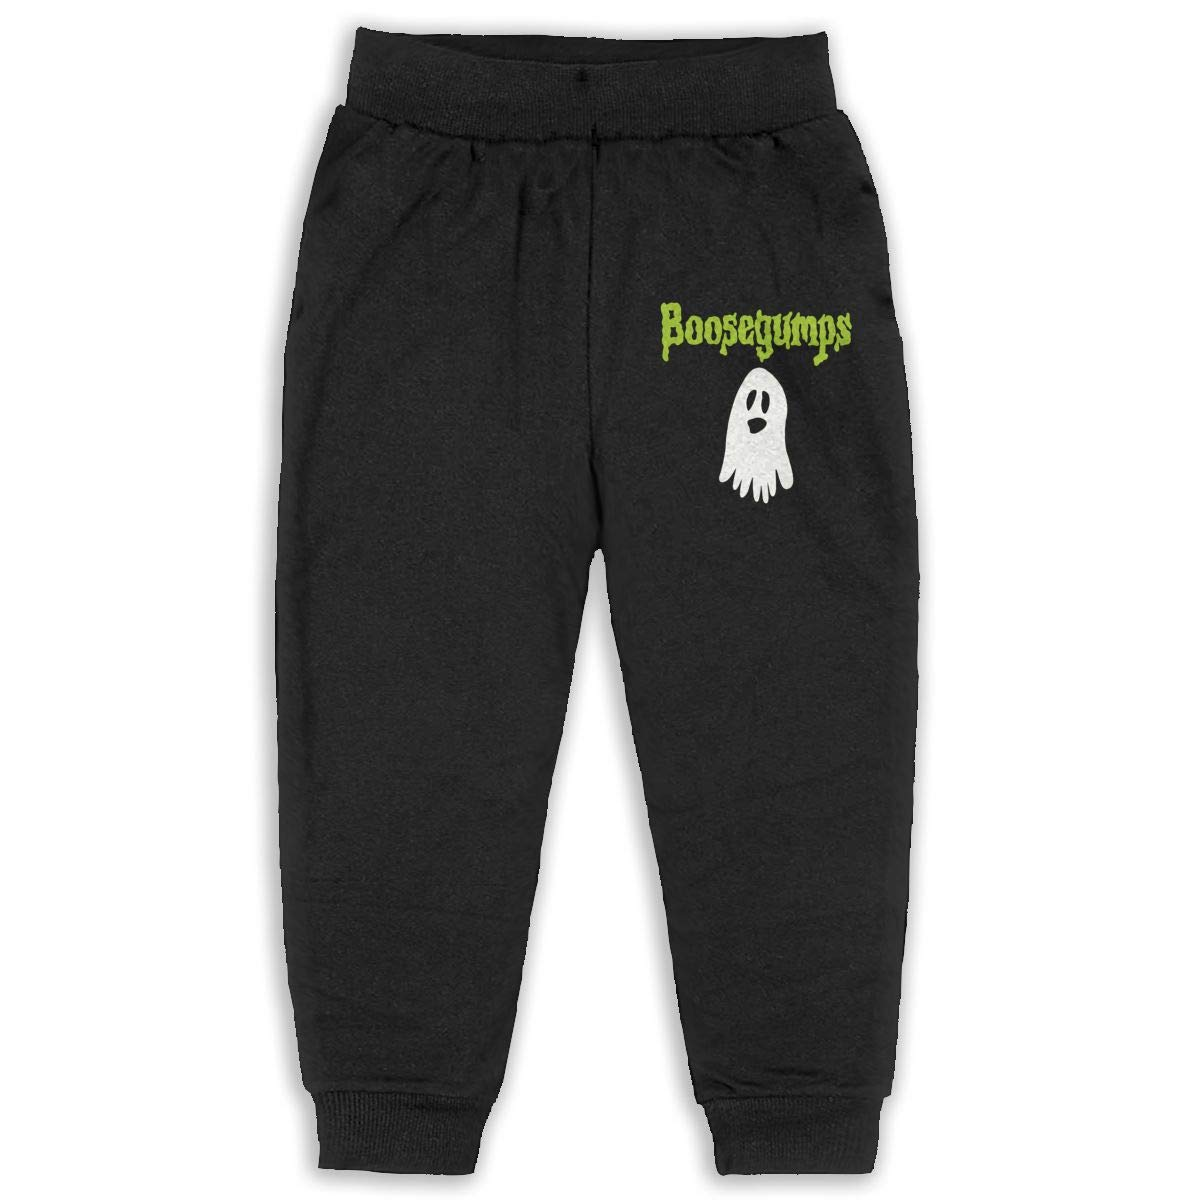 Laoyaotequ Boosegumps Kids Cotton Sweatpants,Jogger Long Jersey Sweatpants